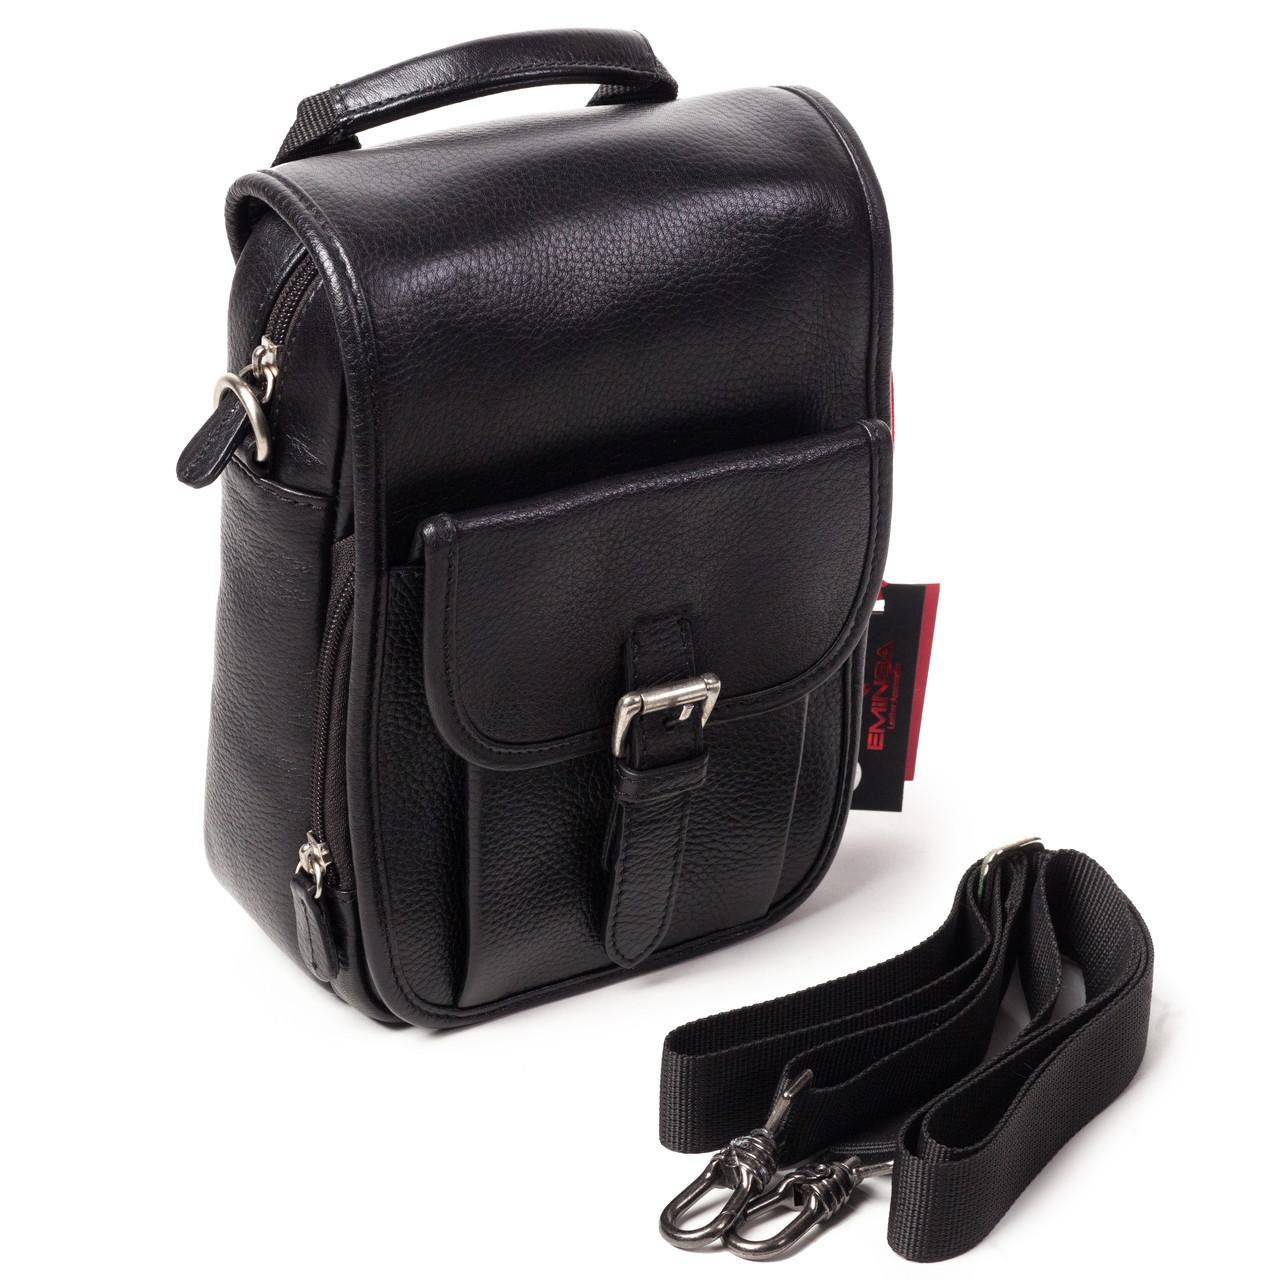 12b9615a83b0 Мужская сумка кожаная черная Eminsa 6059-12-1 - АксМаркет в Киеве